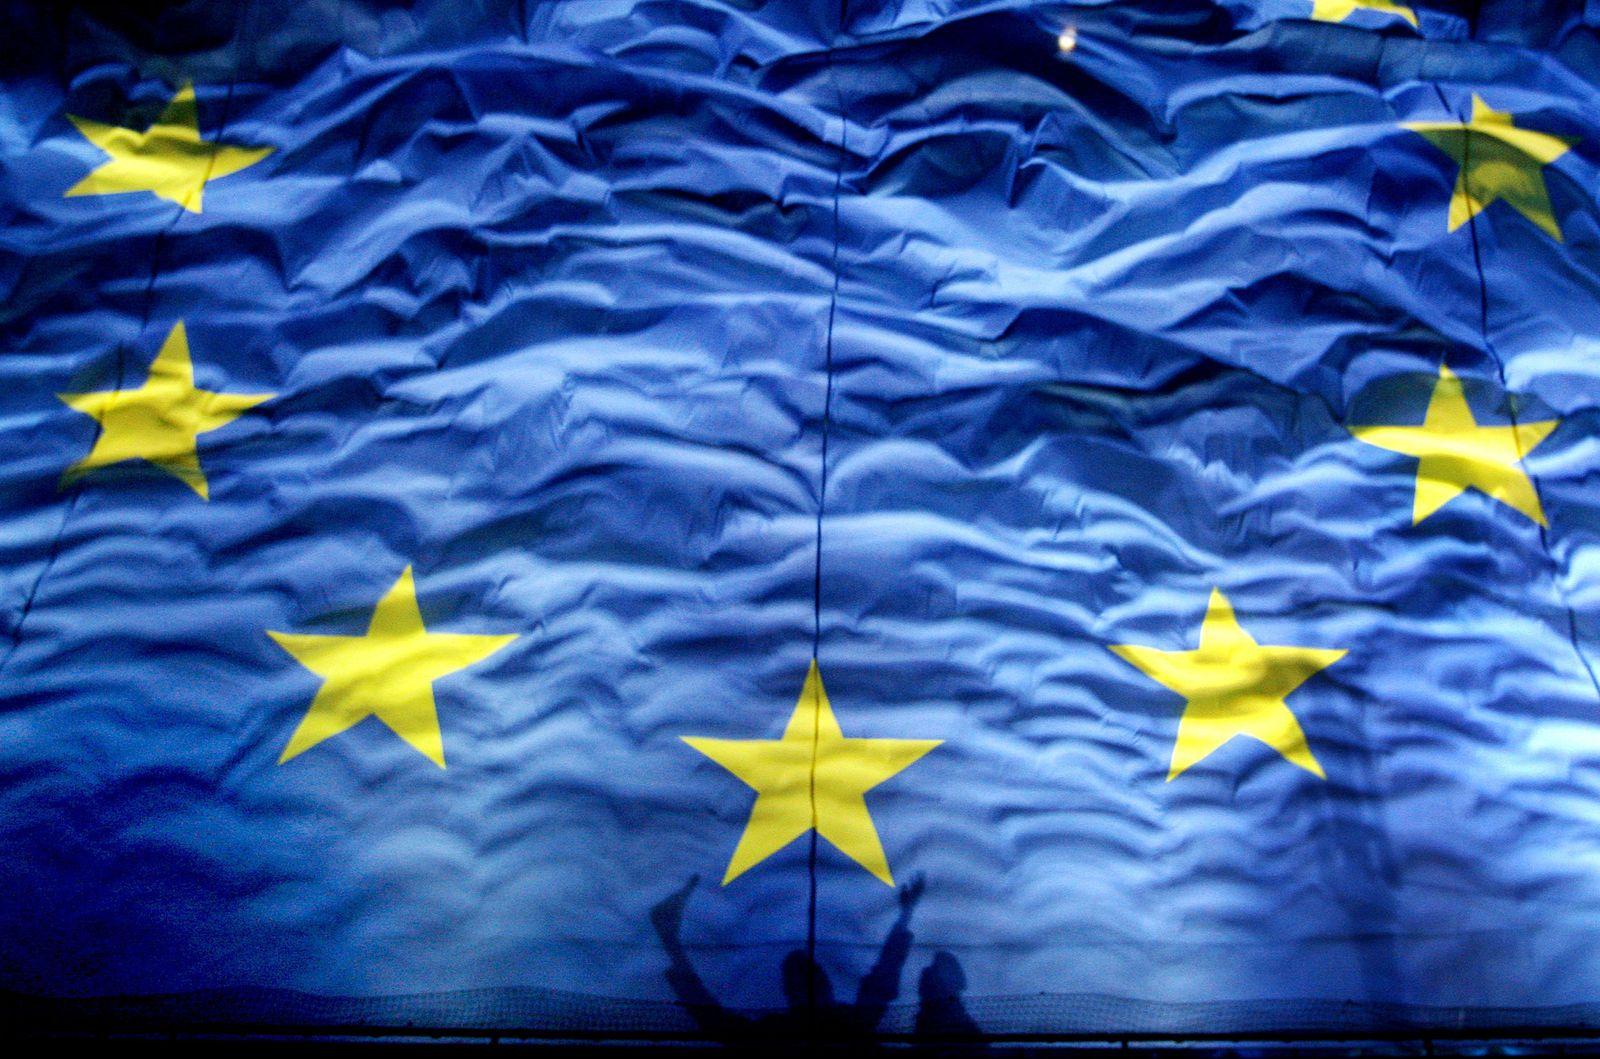 EU/ Flagge/ Fahne/ Symbolbild